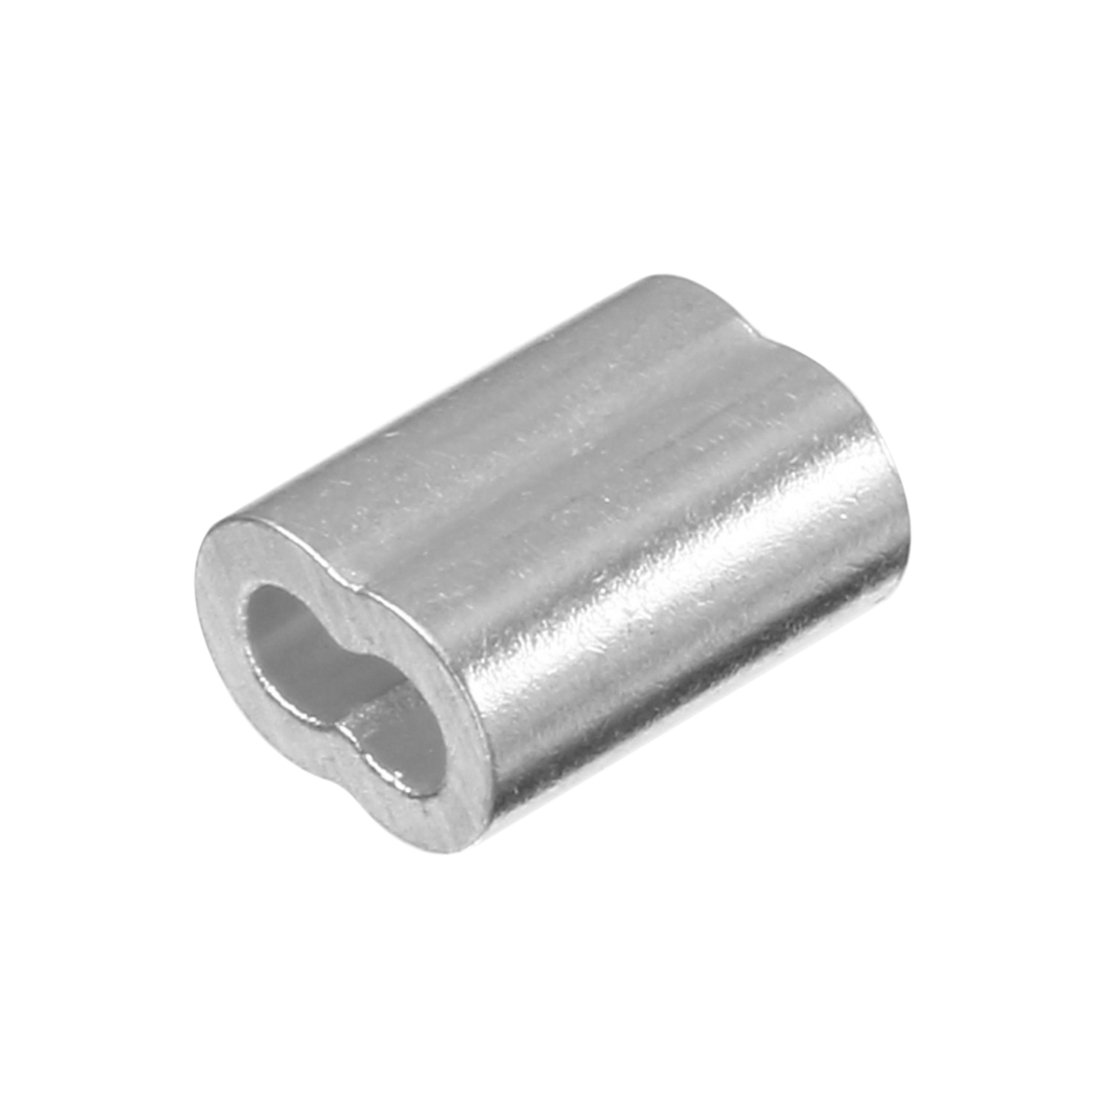 Accesorios Cable Corrugar 100pcs ear Clip 1.2mm Cuerda De Alambre Aluminio Fundas Auricular